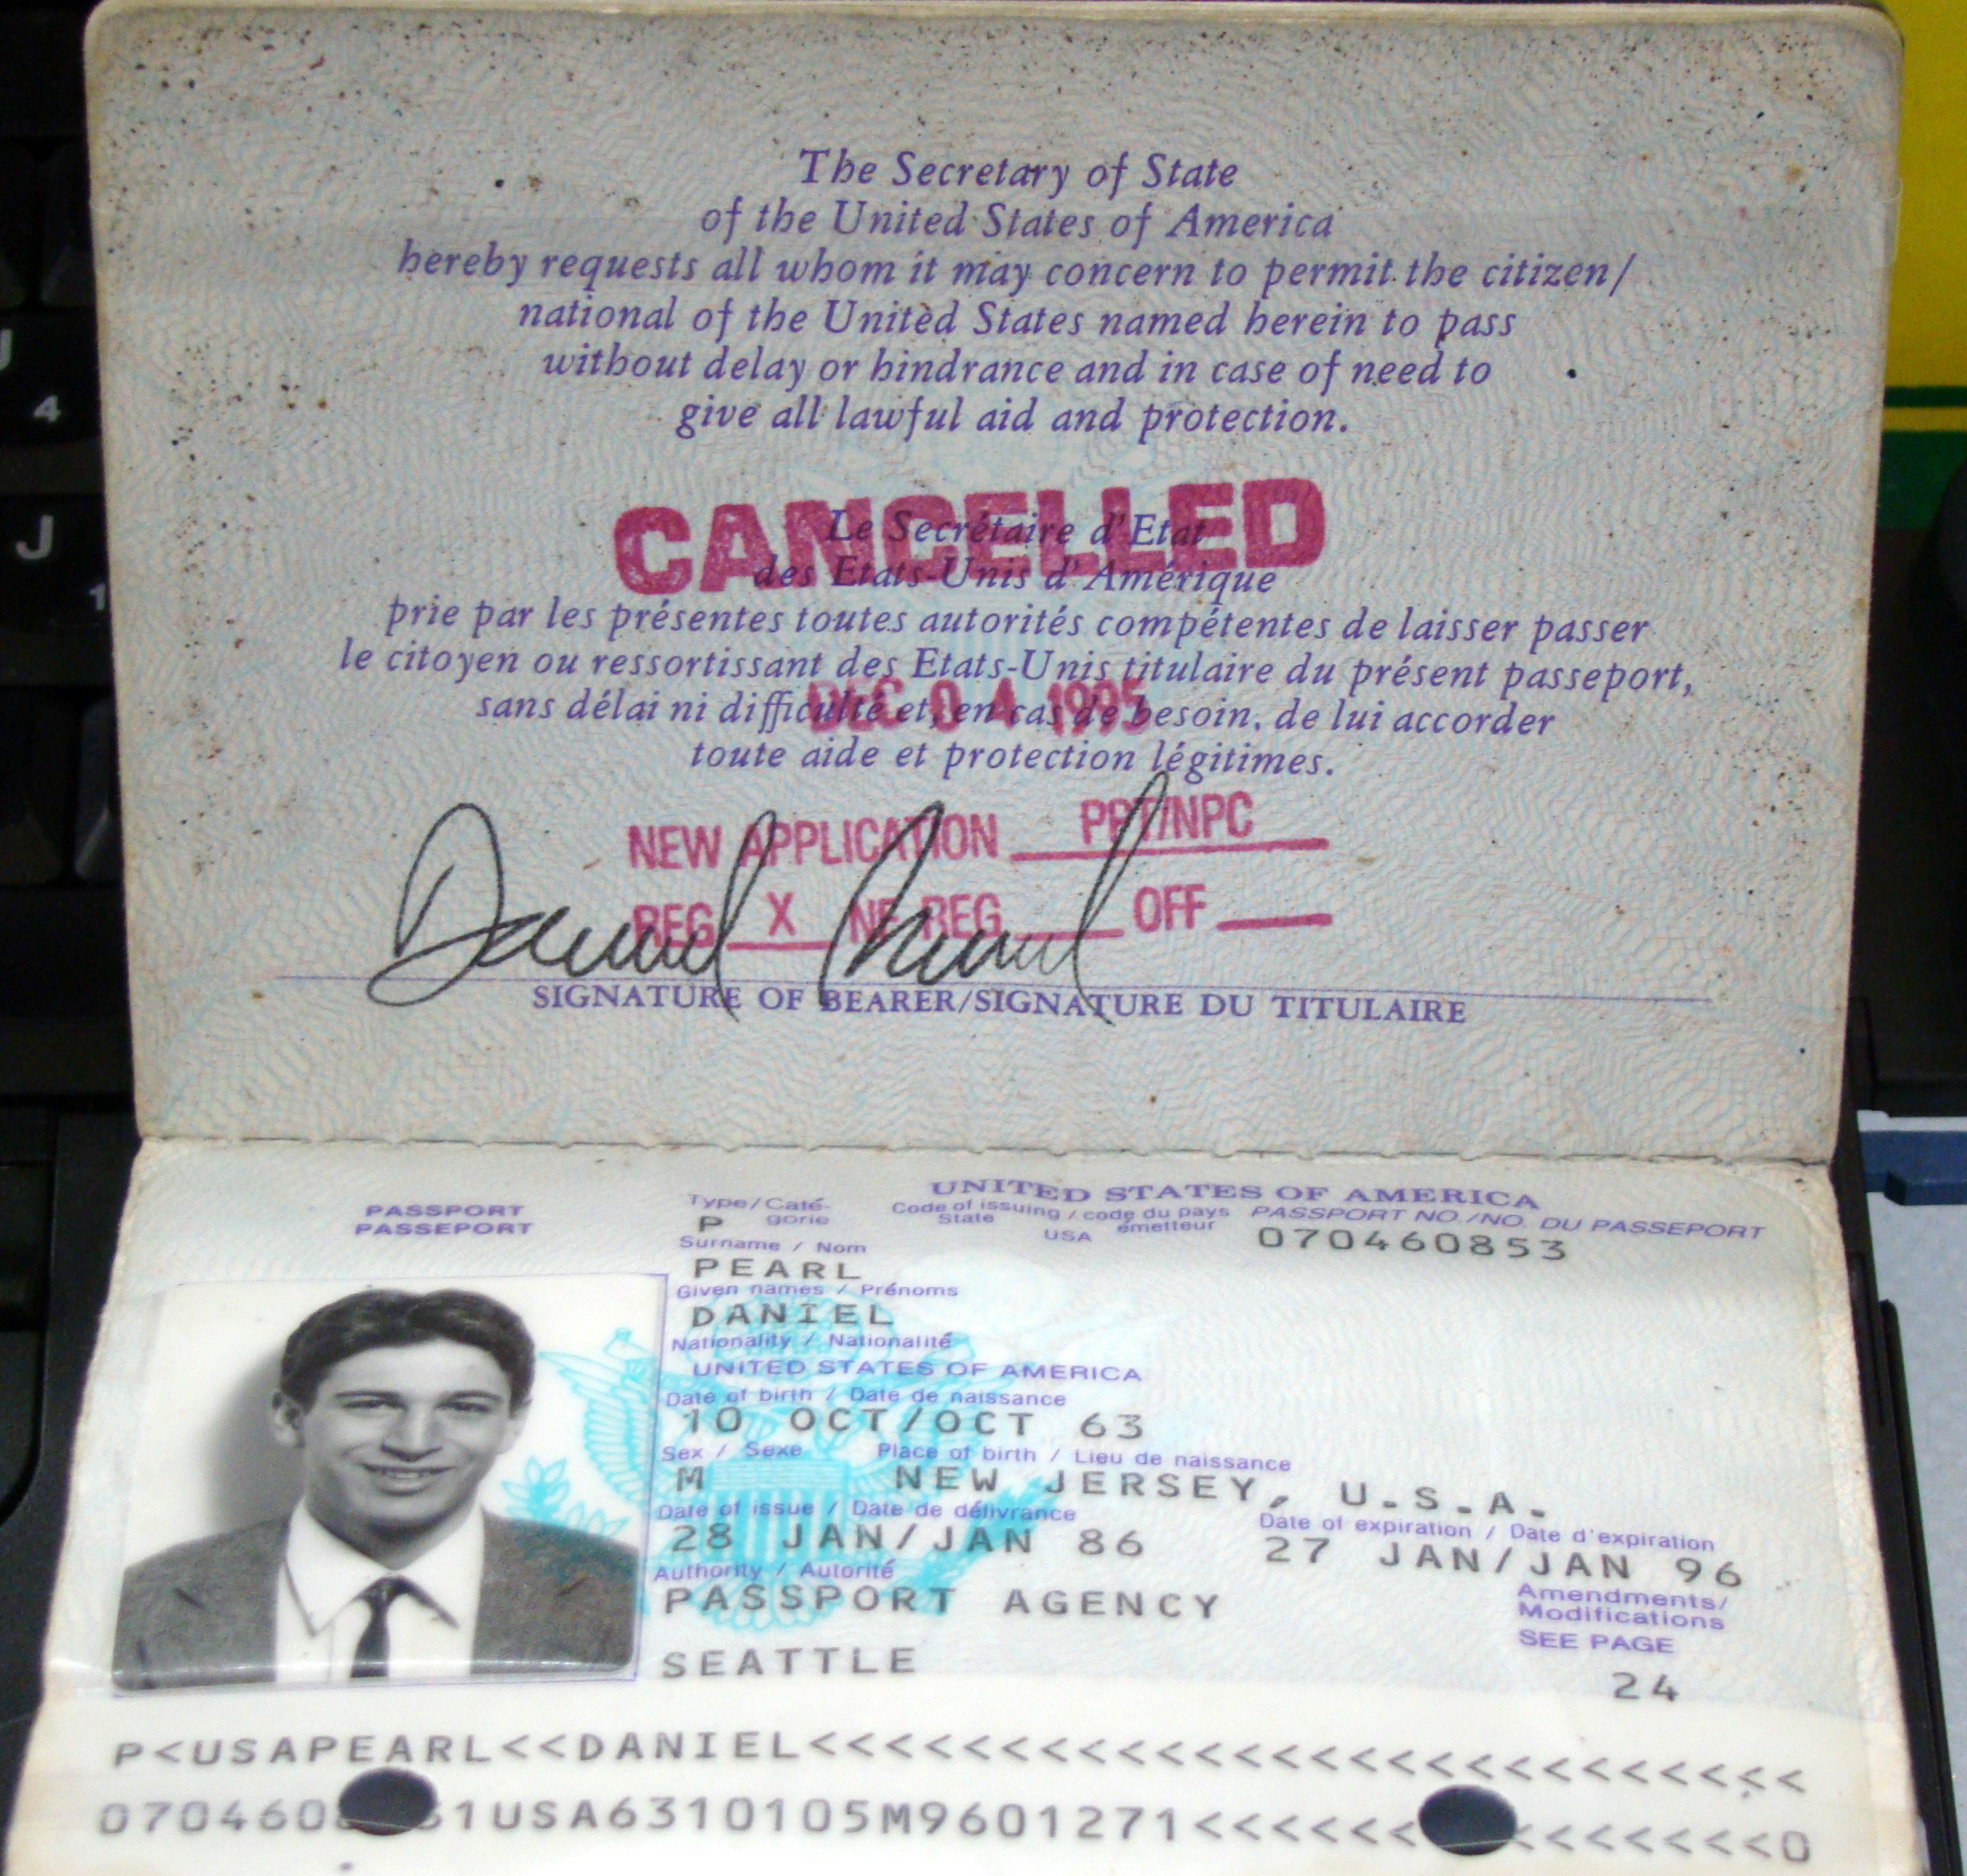 File:Daniel Pearl Passport.JPG - Wikimedia Commons